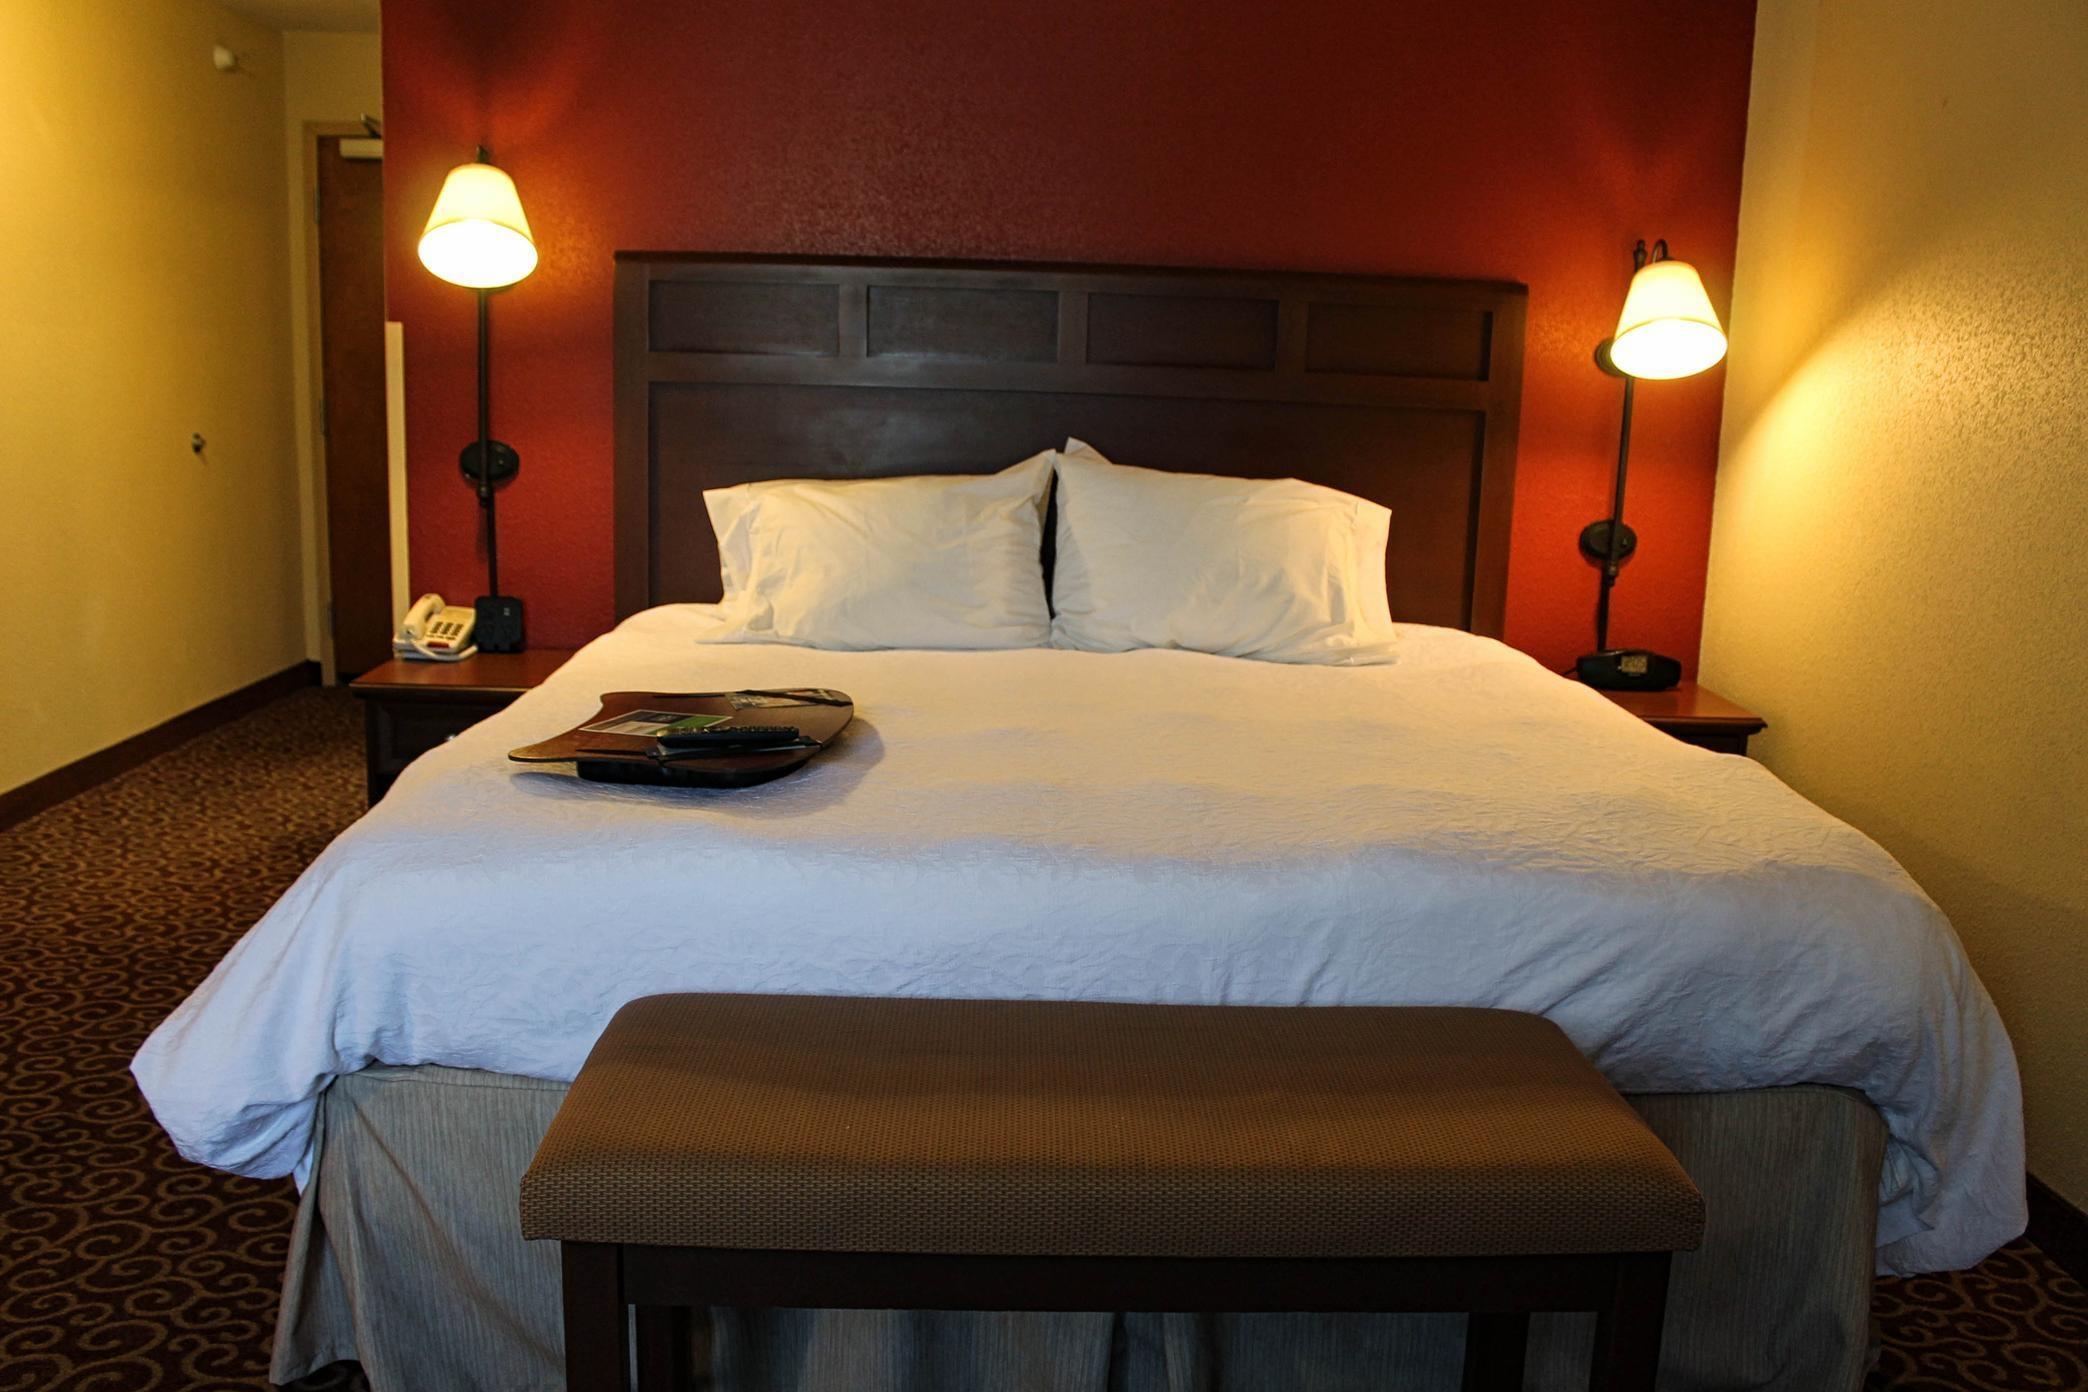 Hampton Inn & Suites Mansfield-South @ I-71 image 8